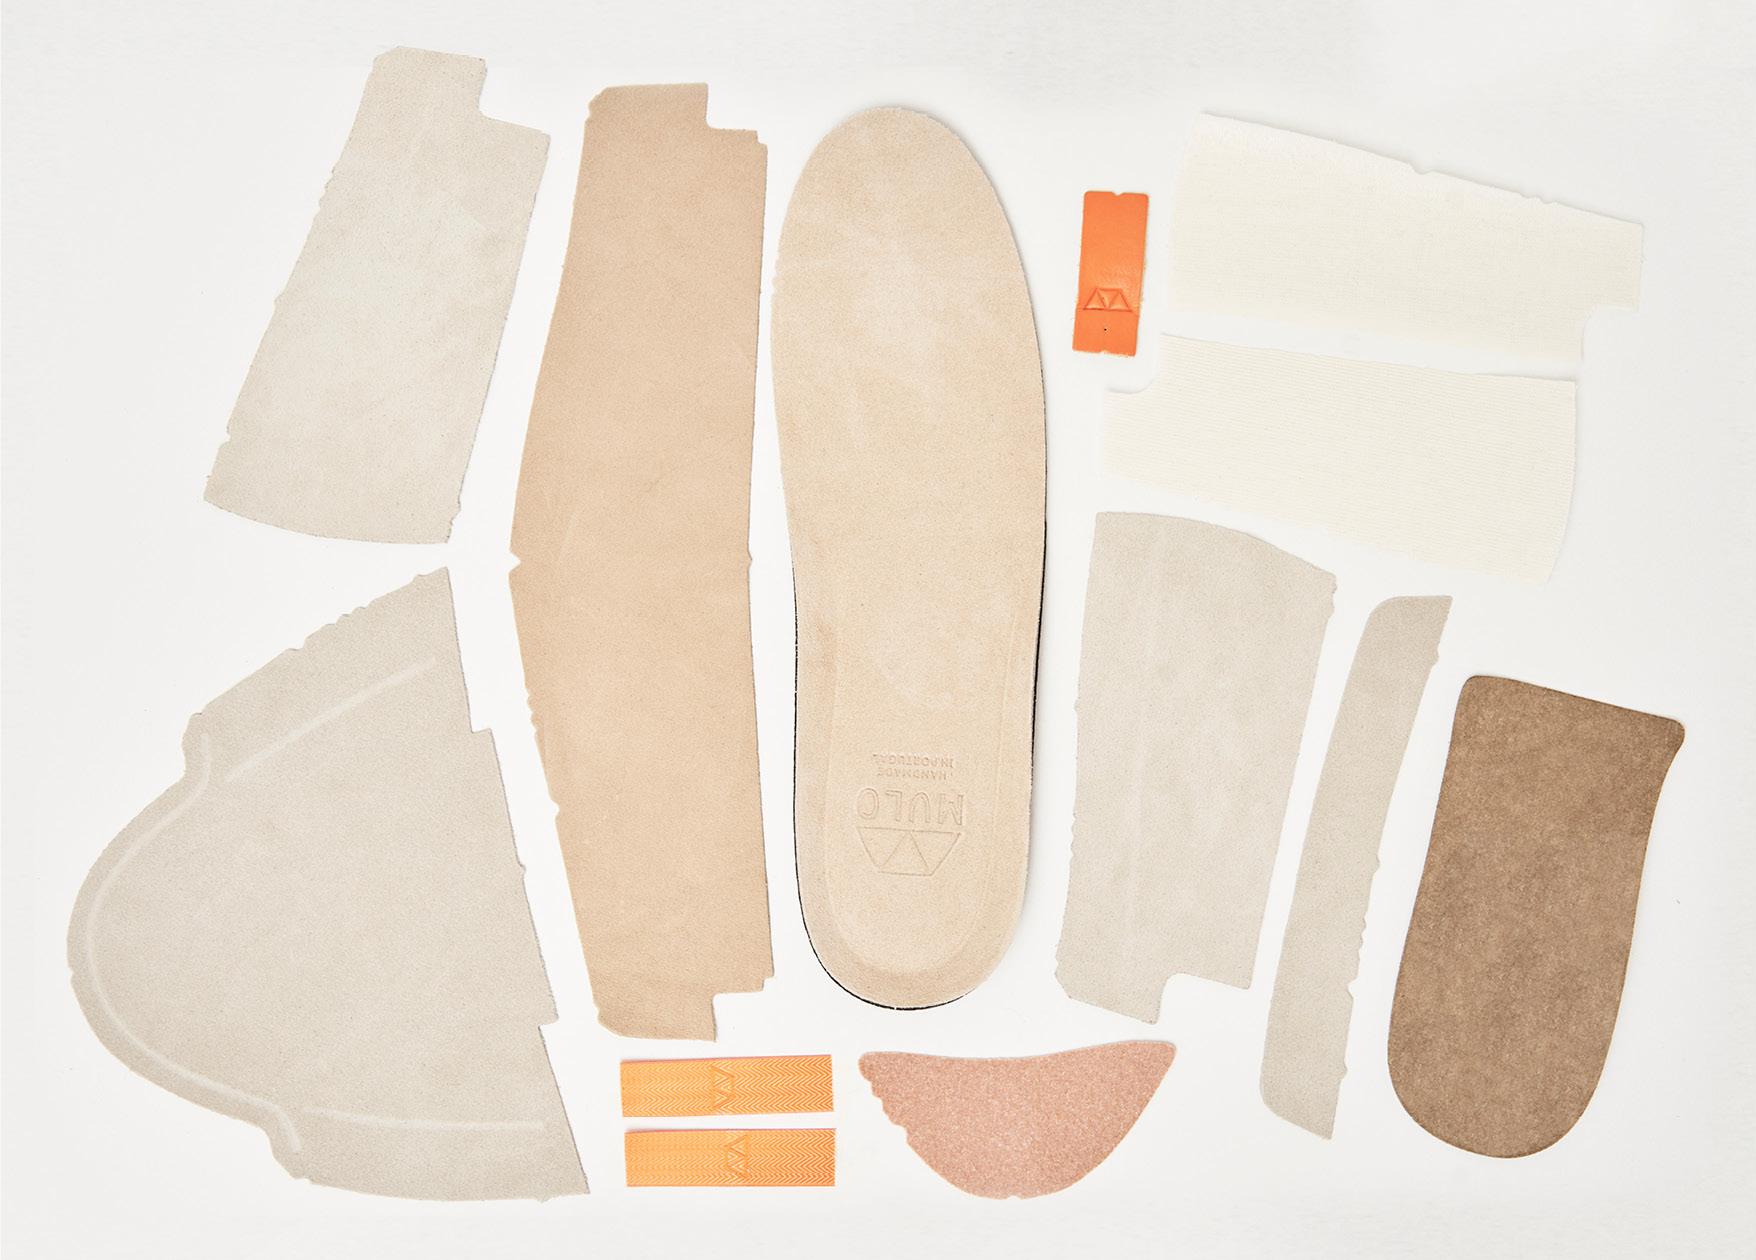 MULO shoe components